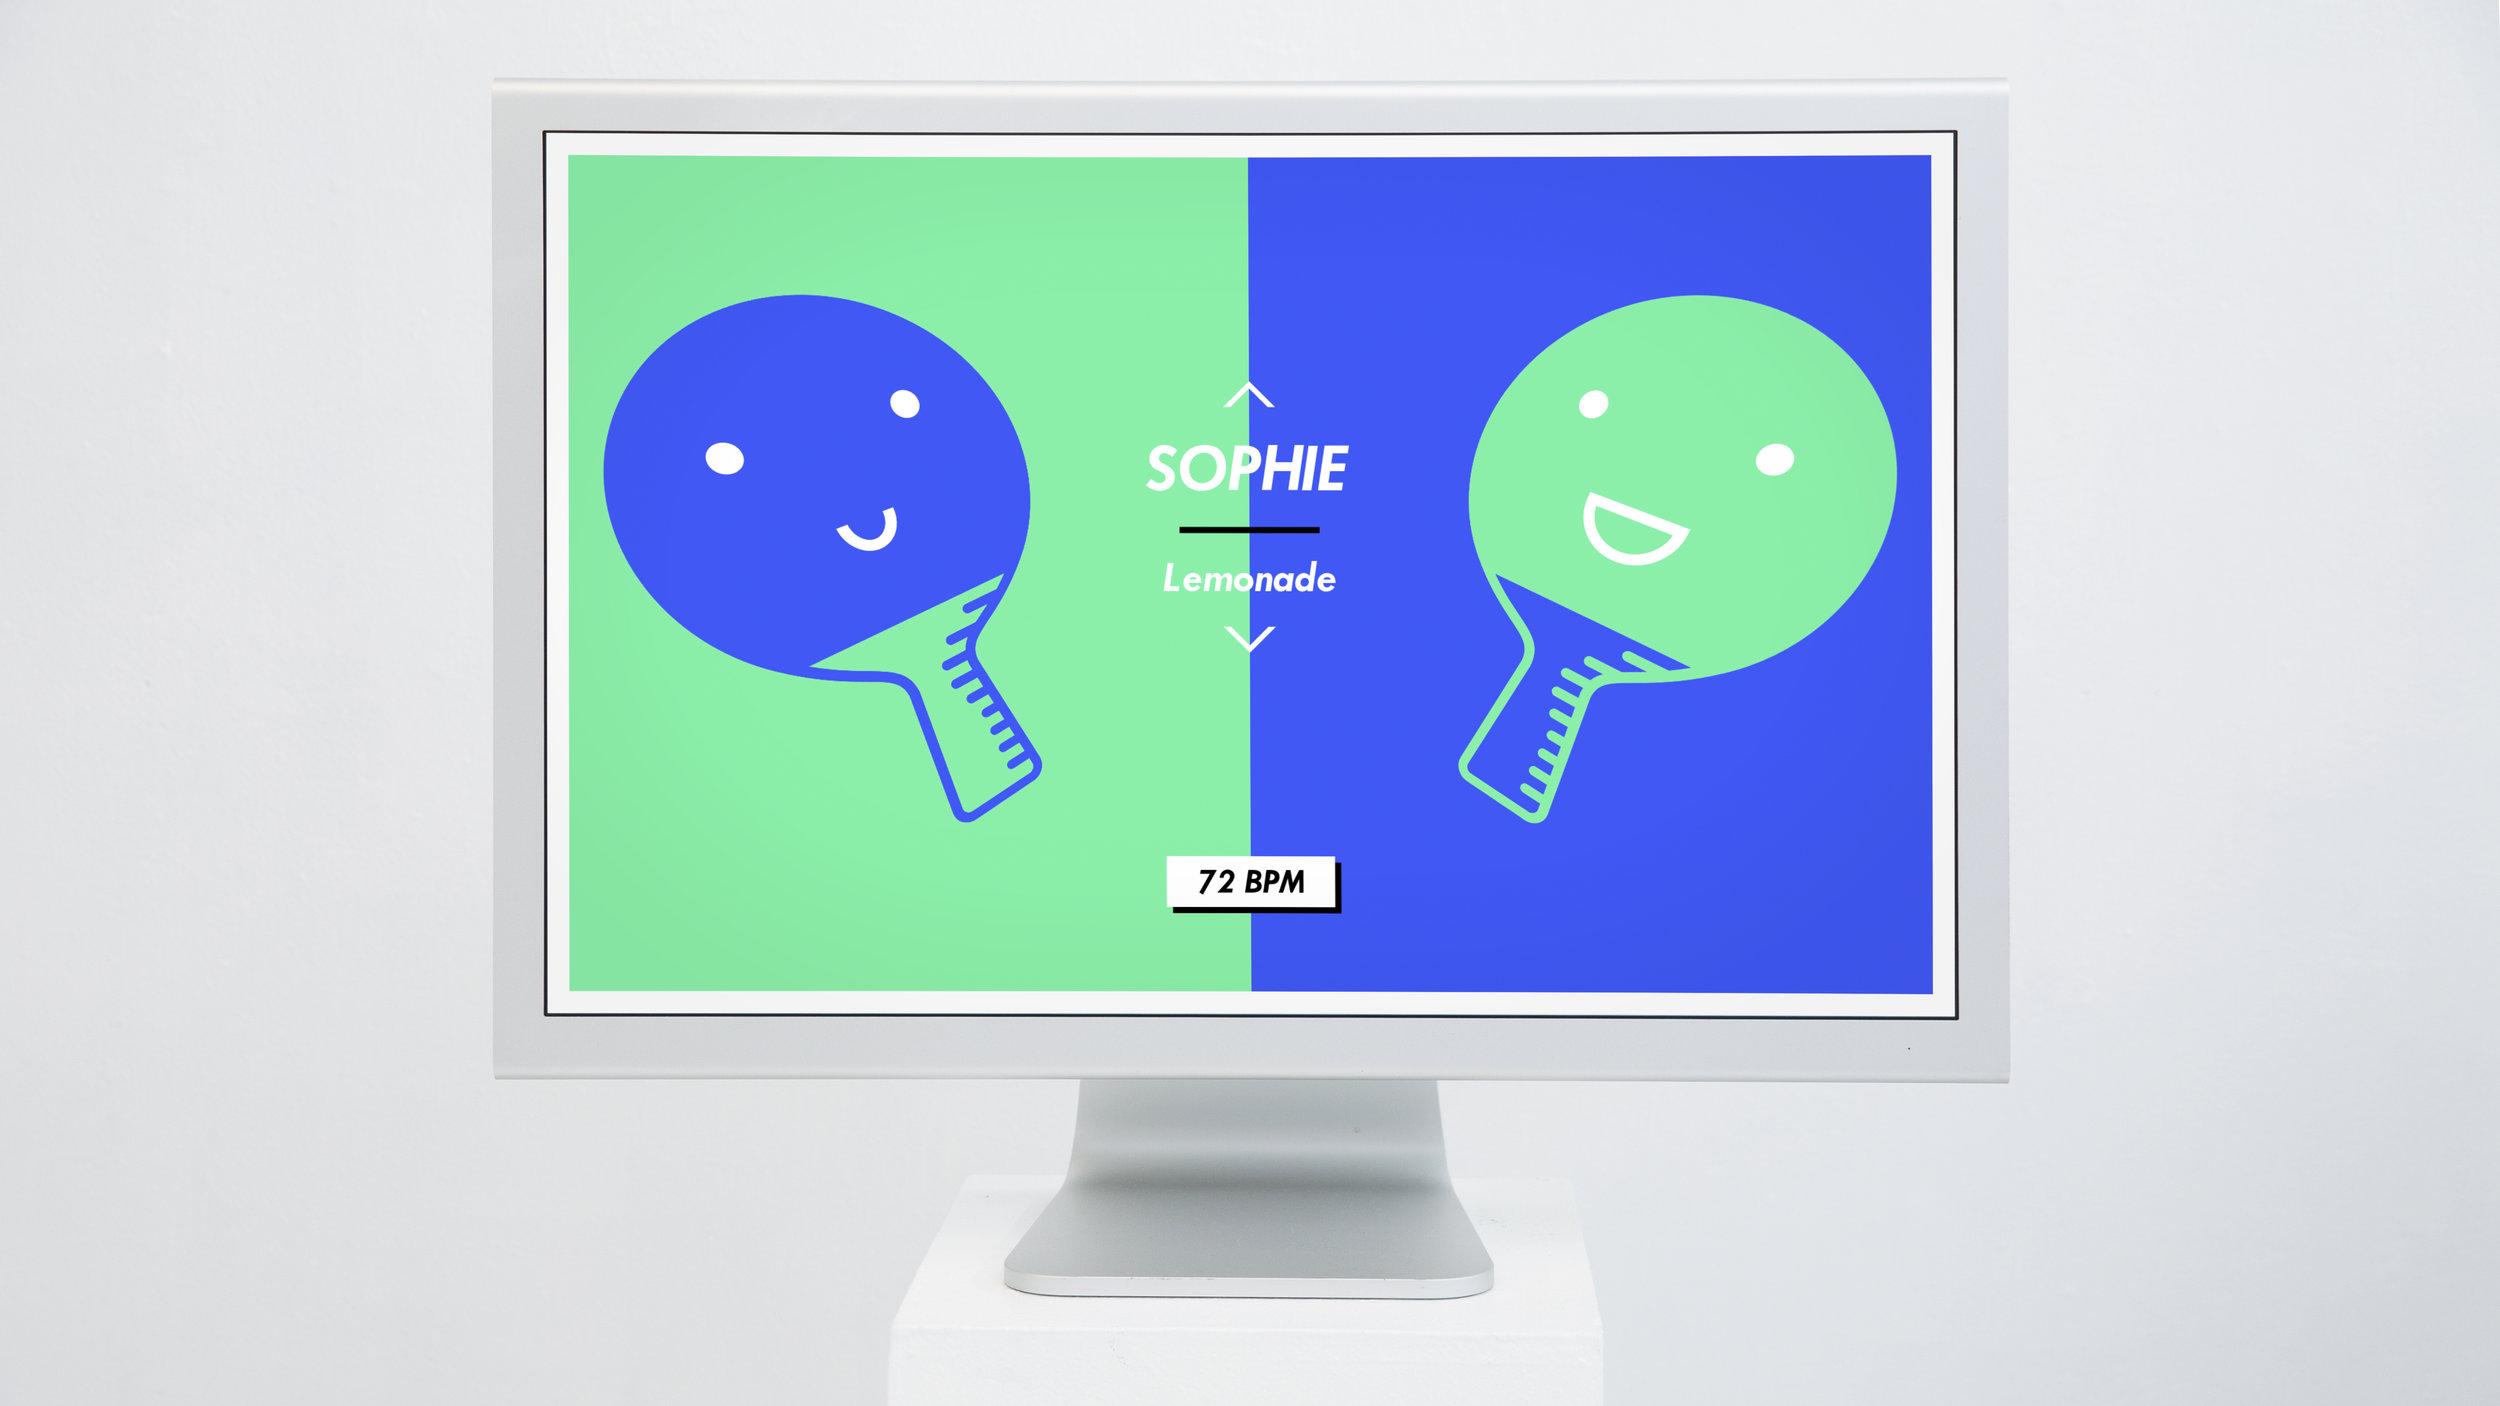 ping-pong-fm-04.jpg